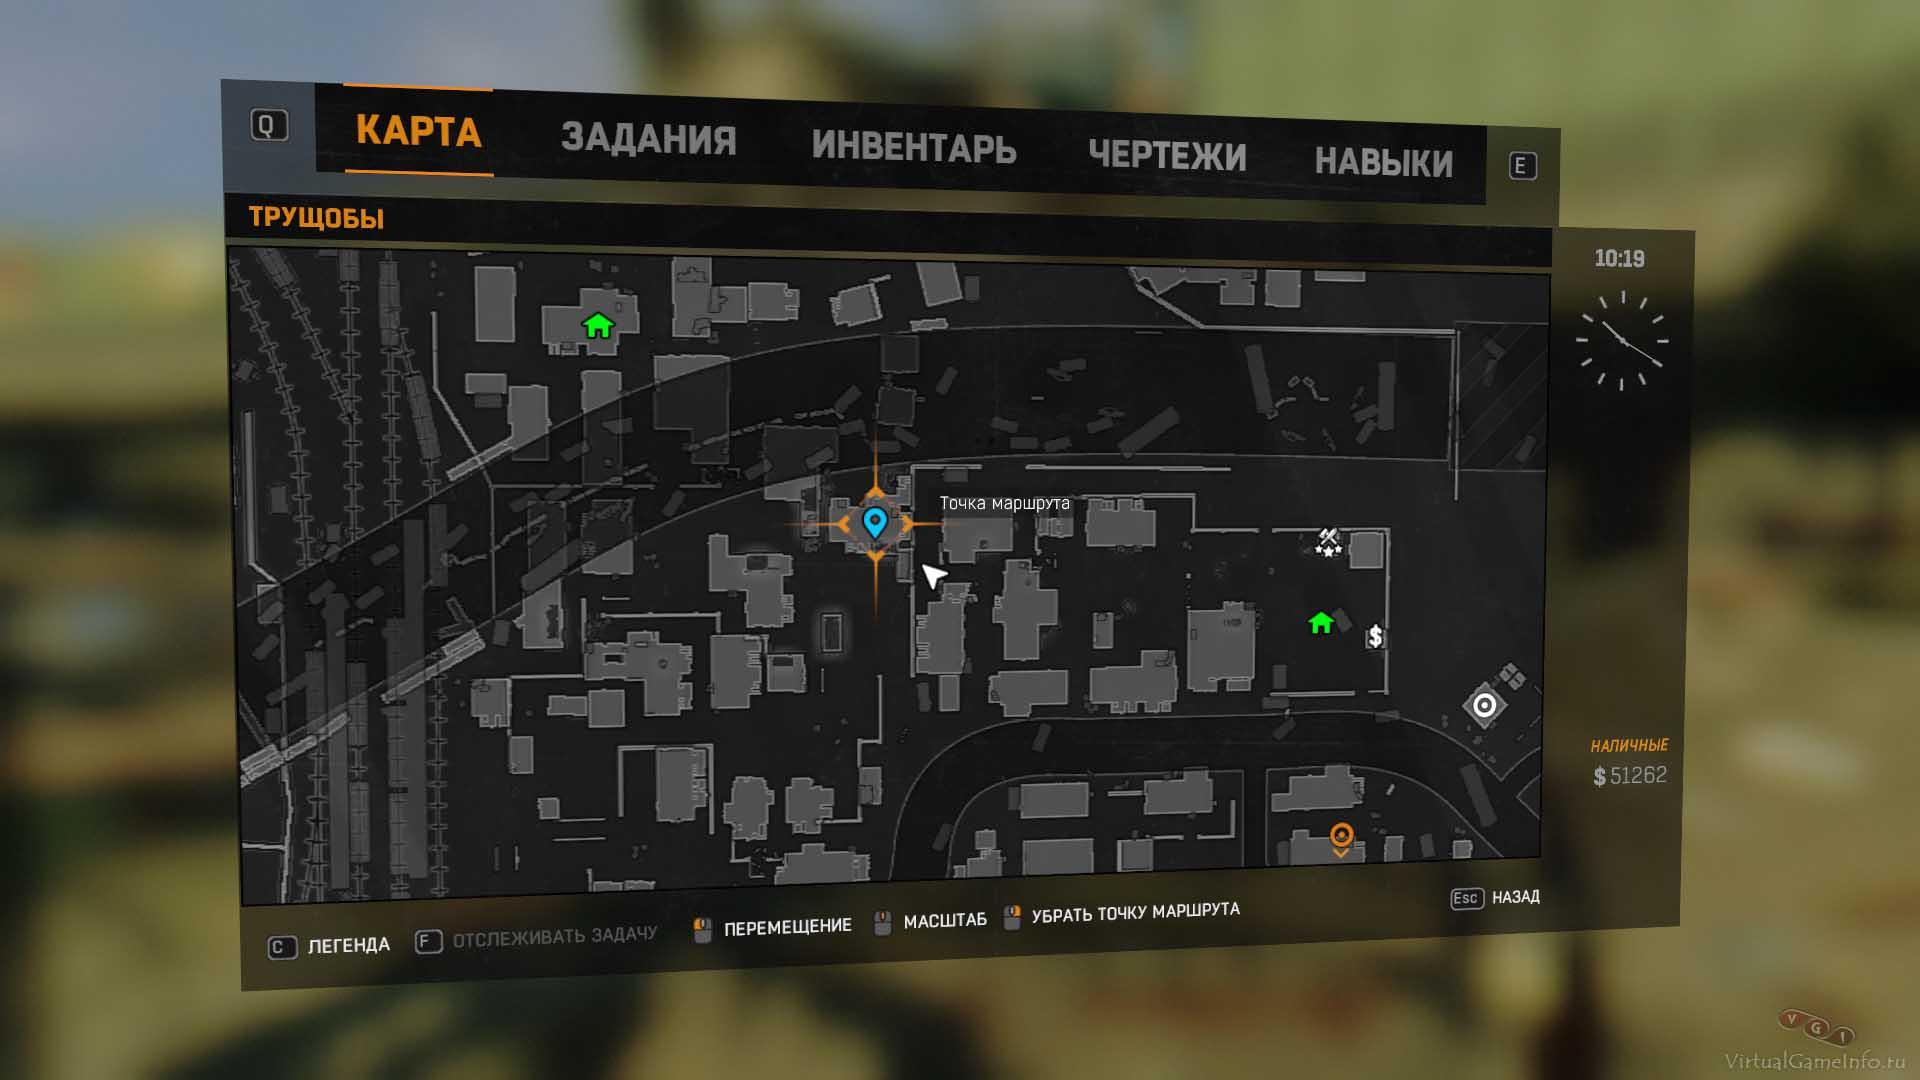 dd-blueprints-barbershop-2 ? VirtualGameInfo.ru